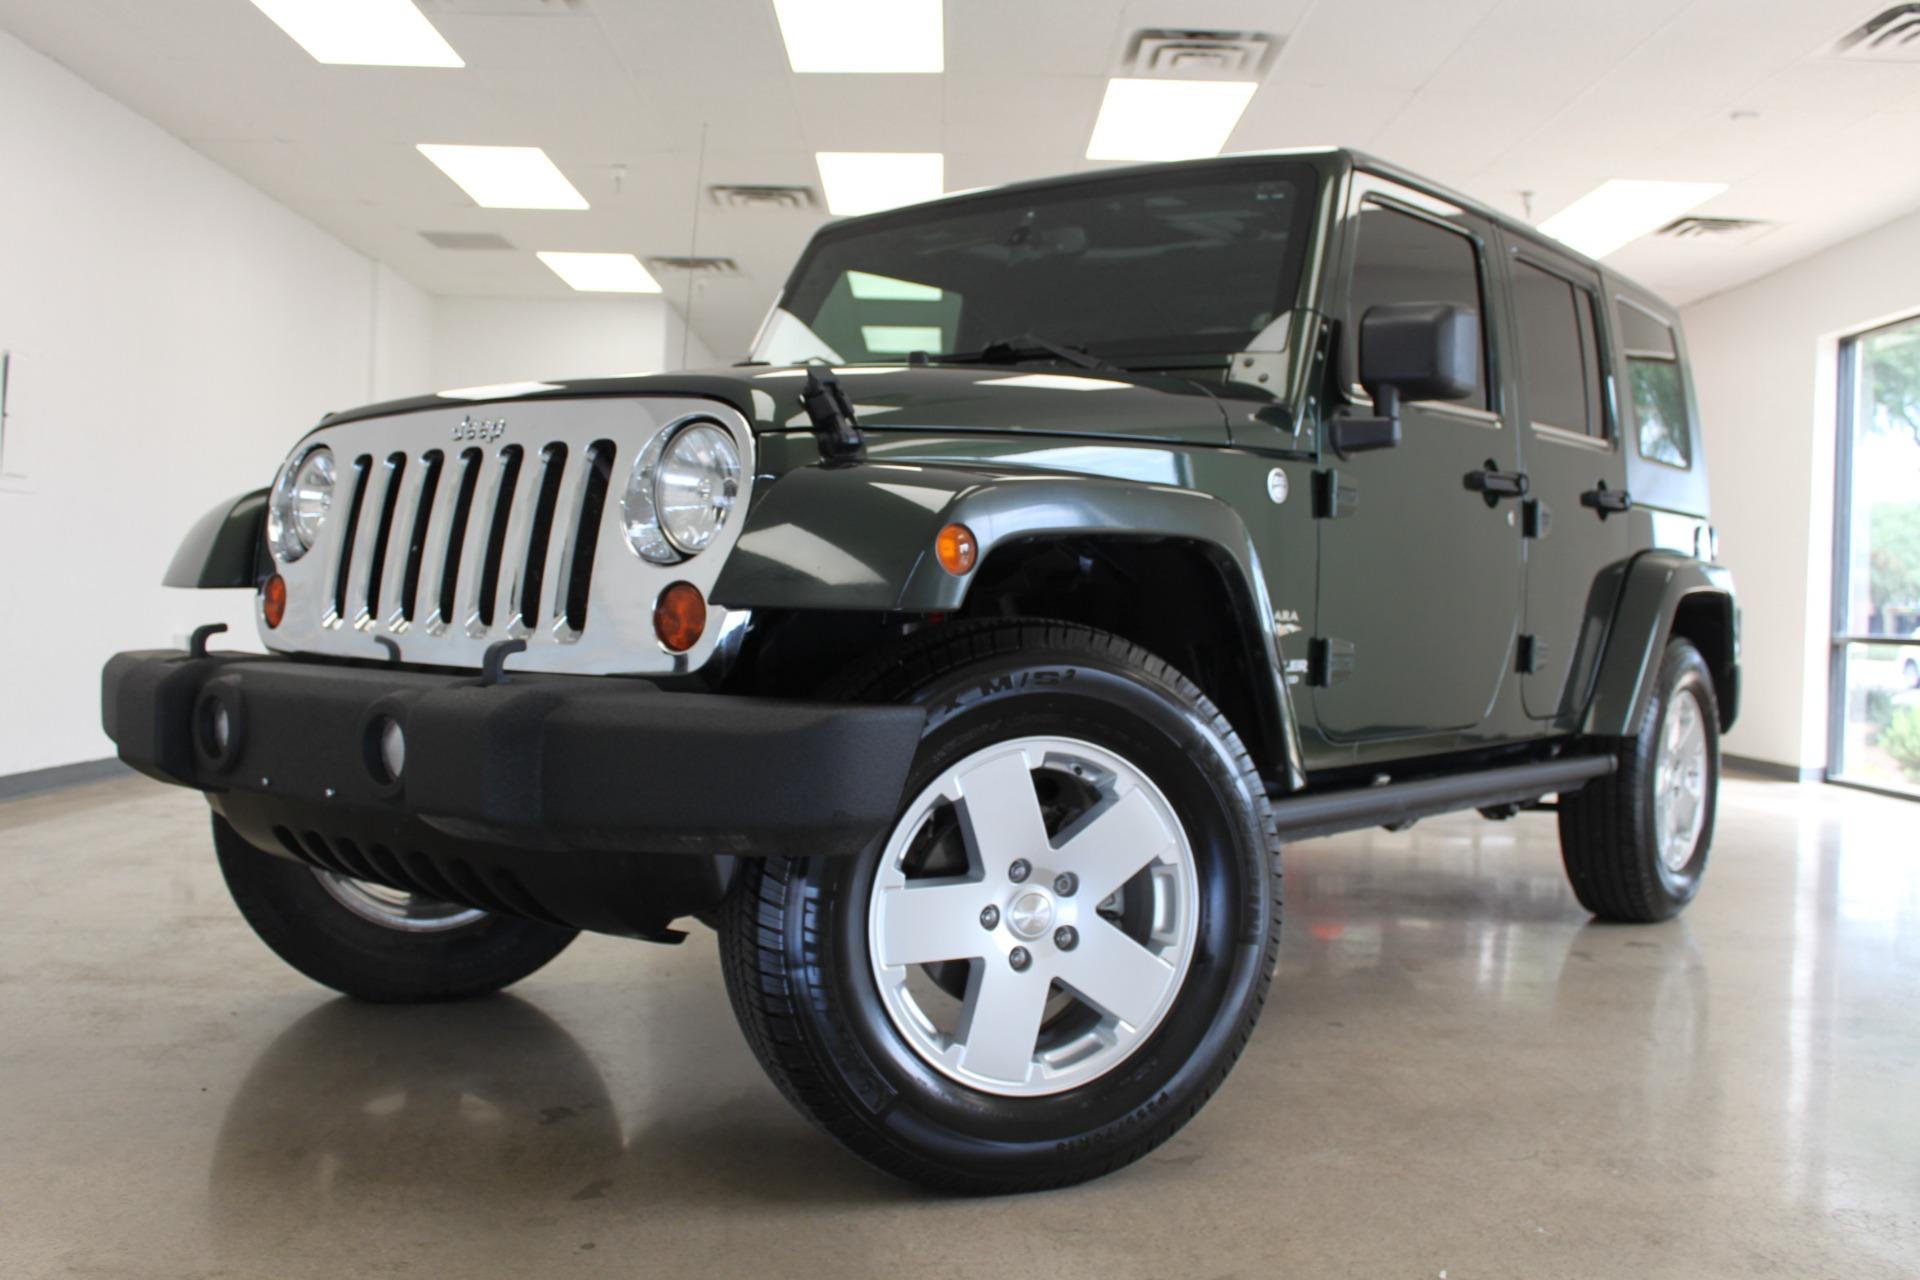 Used-2010-Jeep-Wrangler-Unlimited-Sahara-4X4-Wagoneer